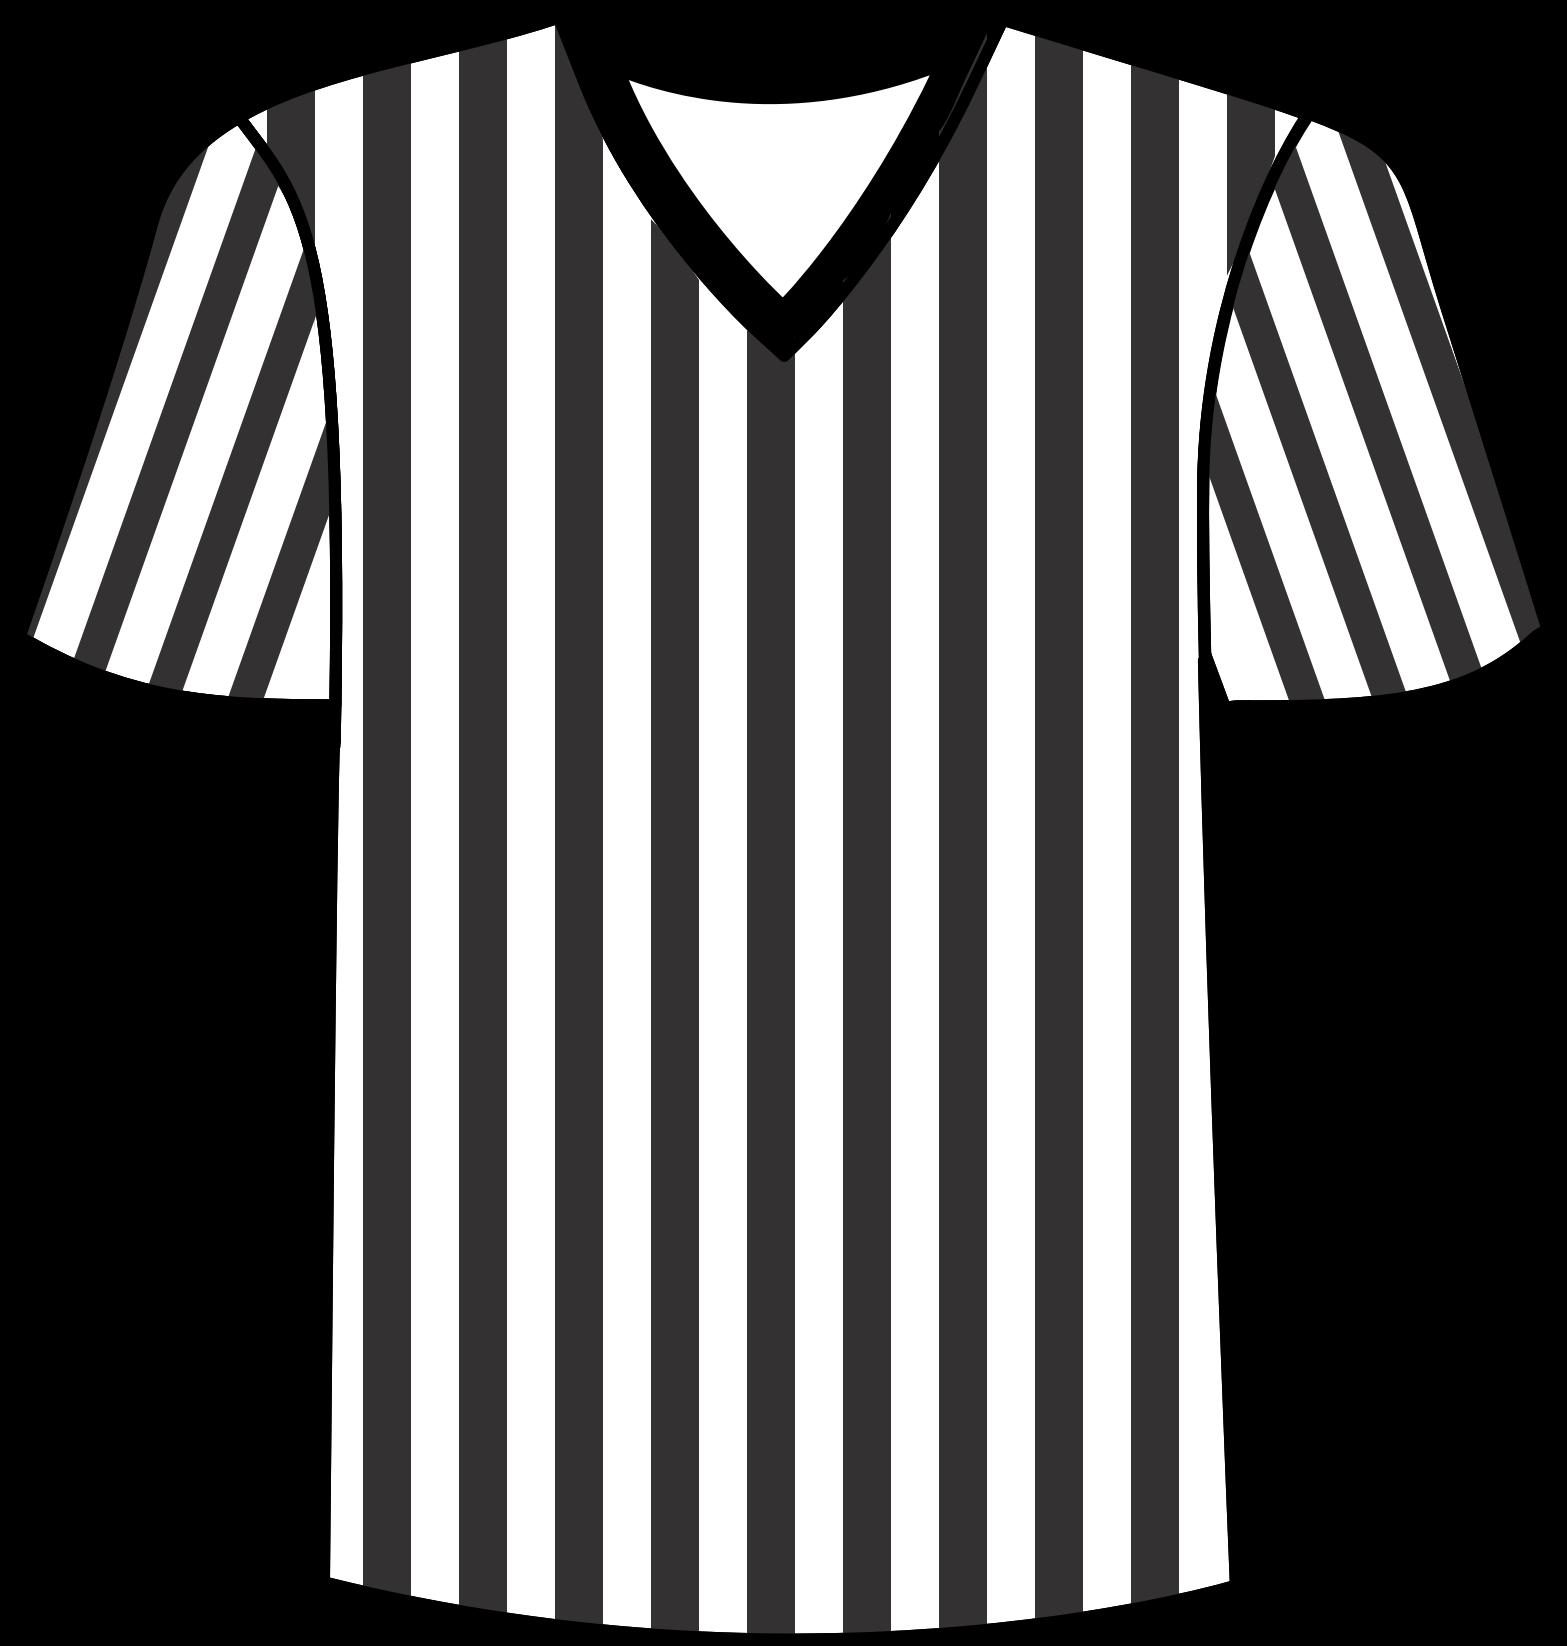 Football referee big image. Clipart shirt uniform